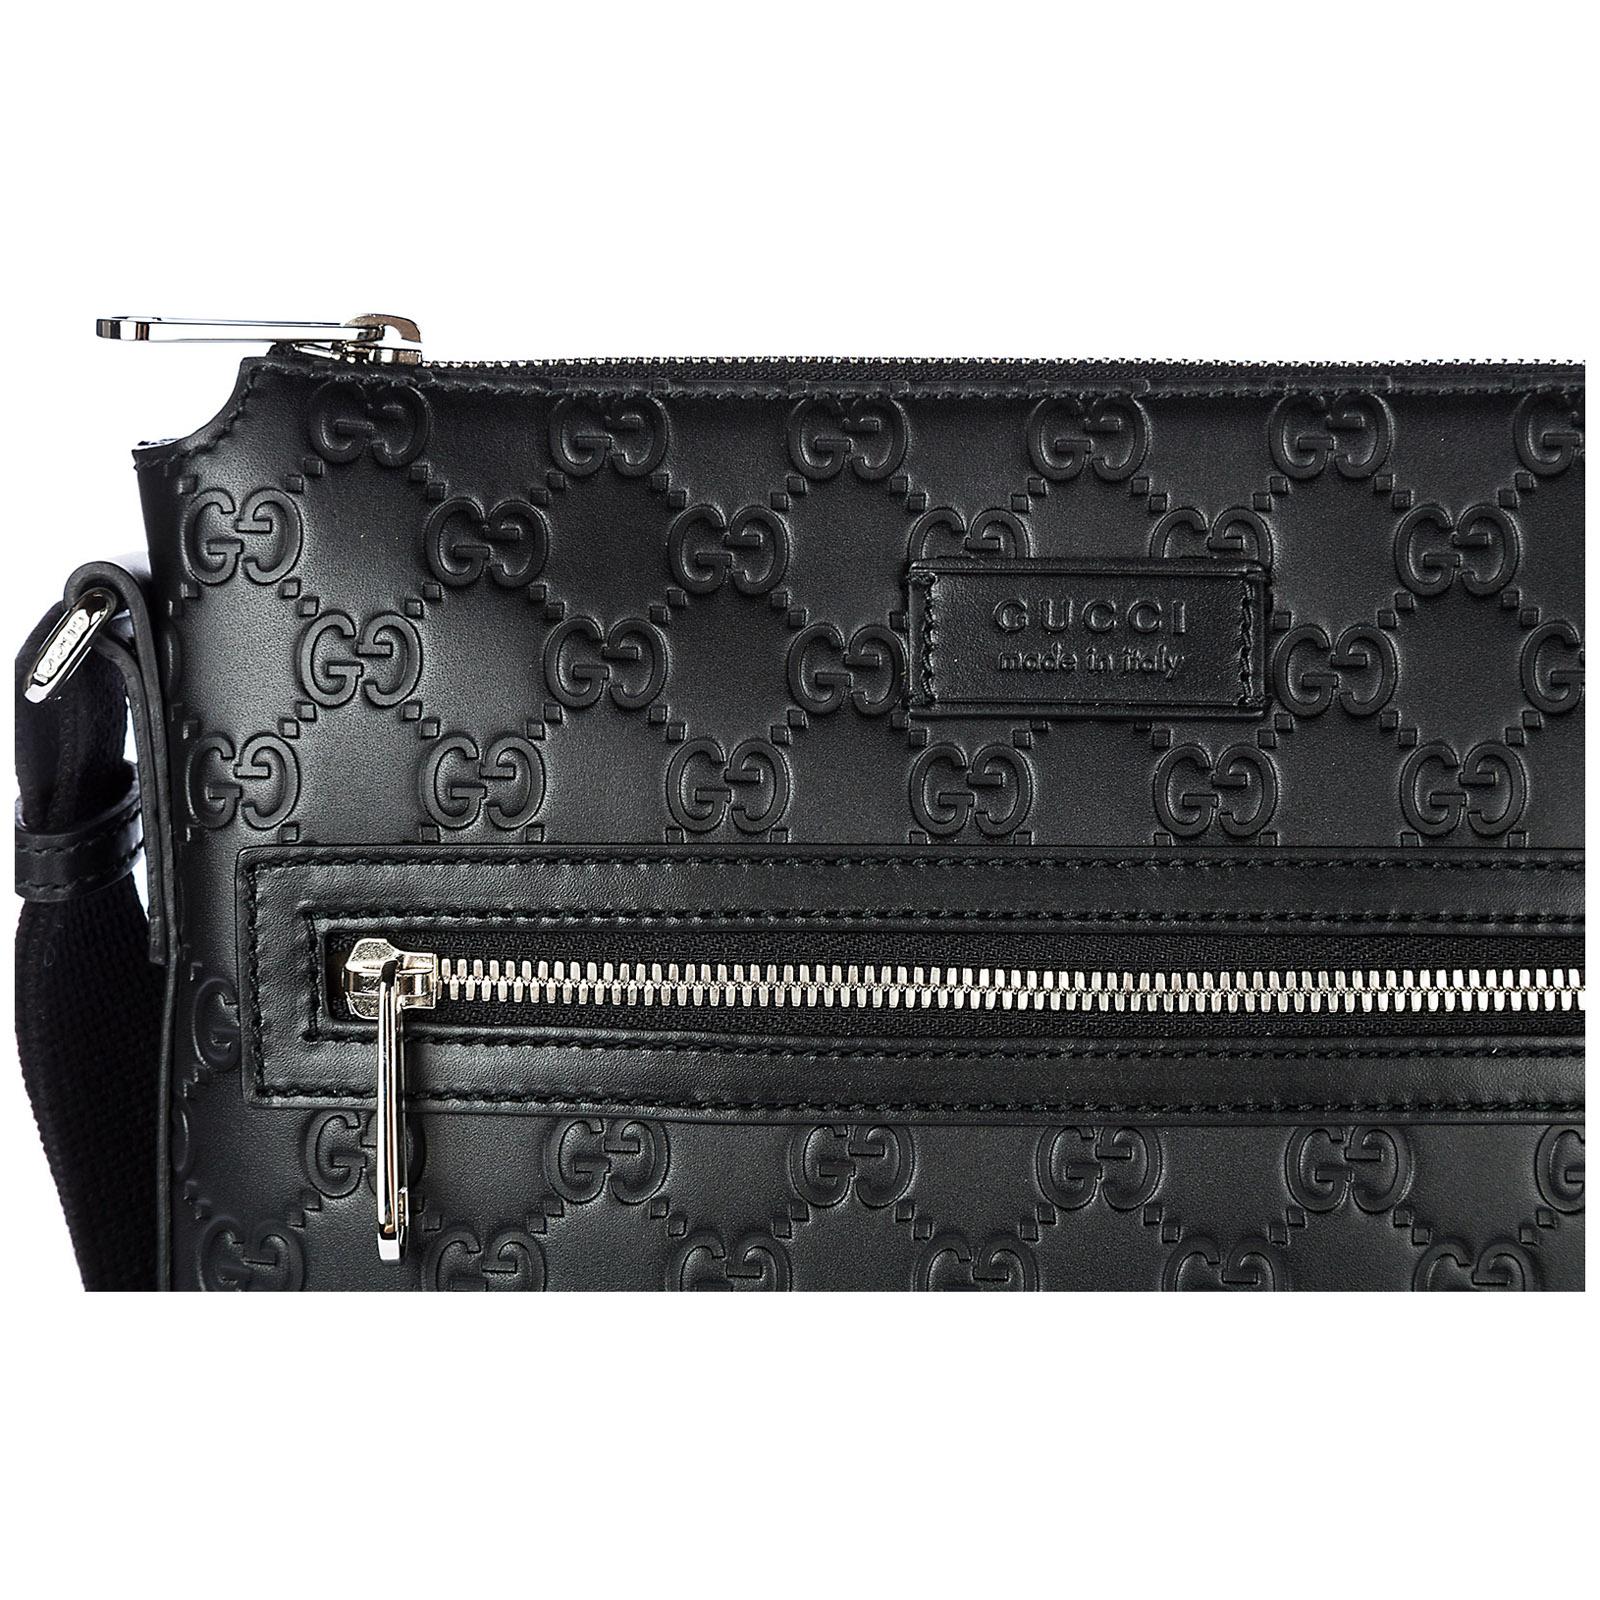 03799f61f004 Gucci Men s leather cross-body messenger shoulder bag signature